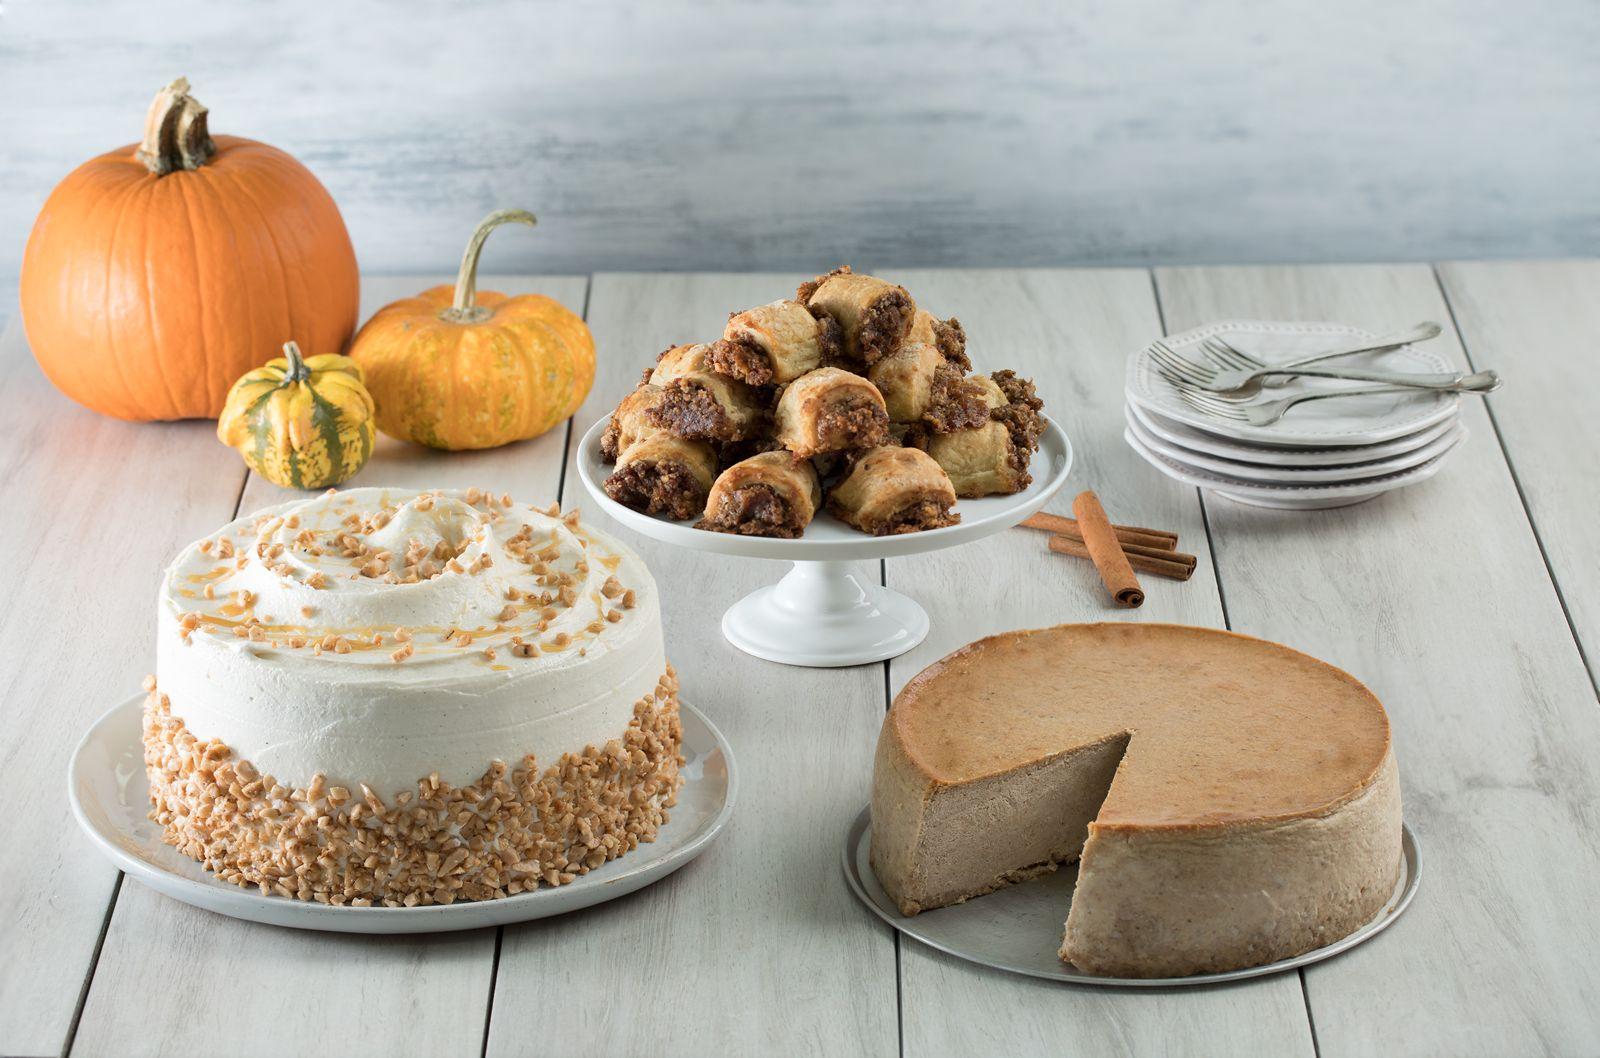 Seasonal Favorites Return to TooJay's Deli for the Fall Season